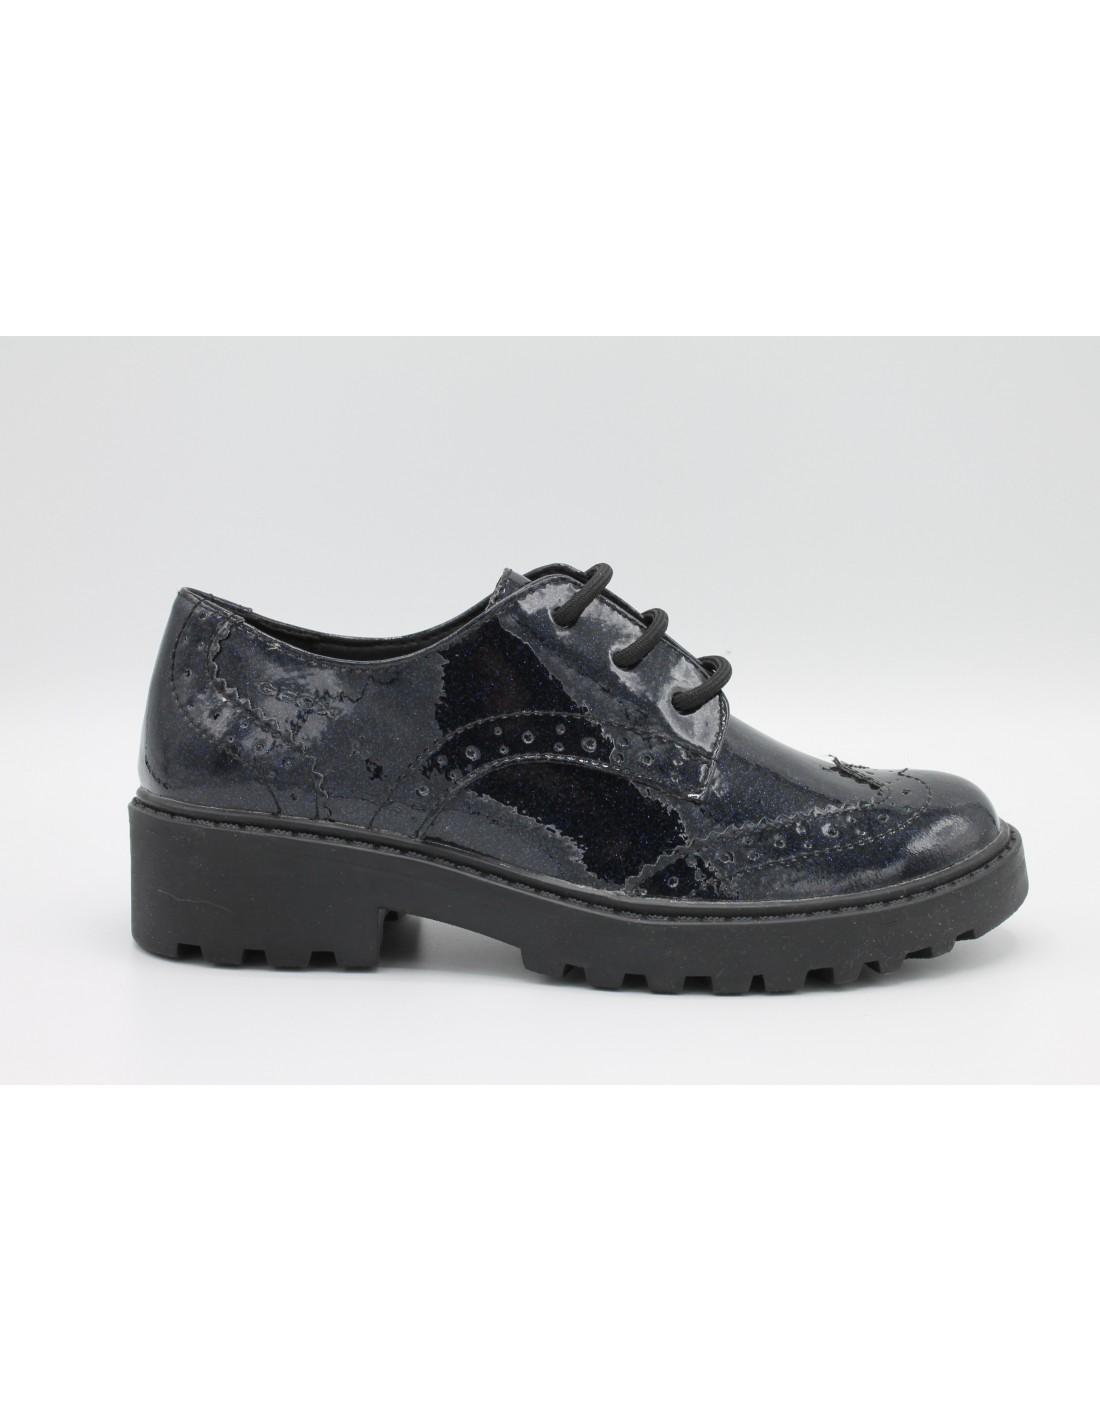 the latest cbe42 c47a7 Geox scarpe bimba/ragazza/donna glitter navy derby inglesina linea Casey  J6420K - Angela Barba